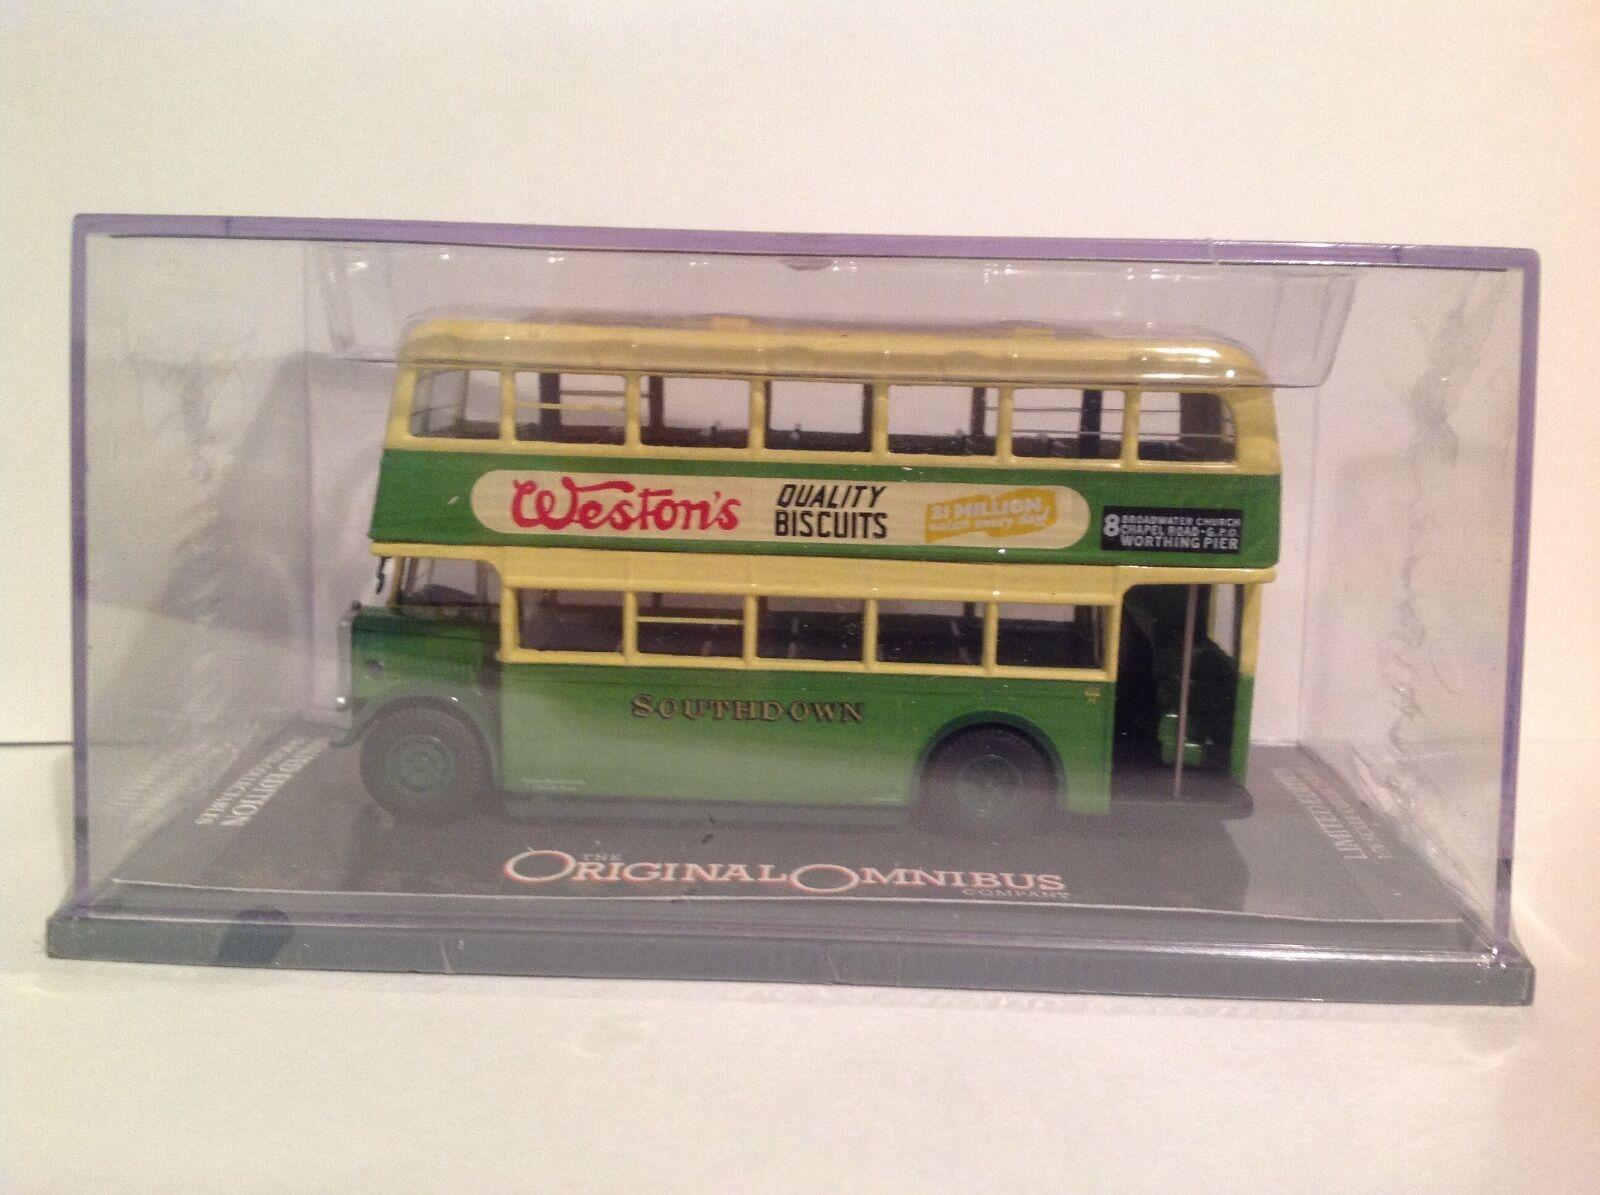 OM43909 Guy Arab Utility Bus Southdown Motor Services LTD Edition 0001 of 2500